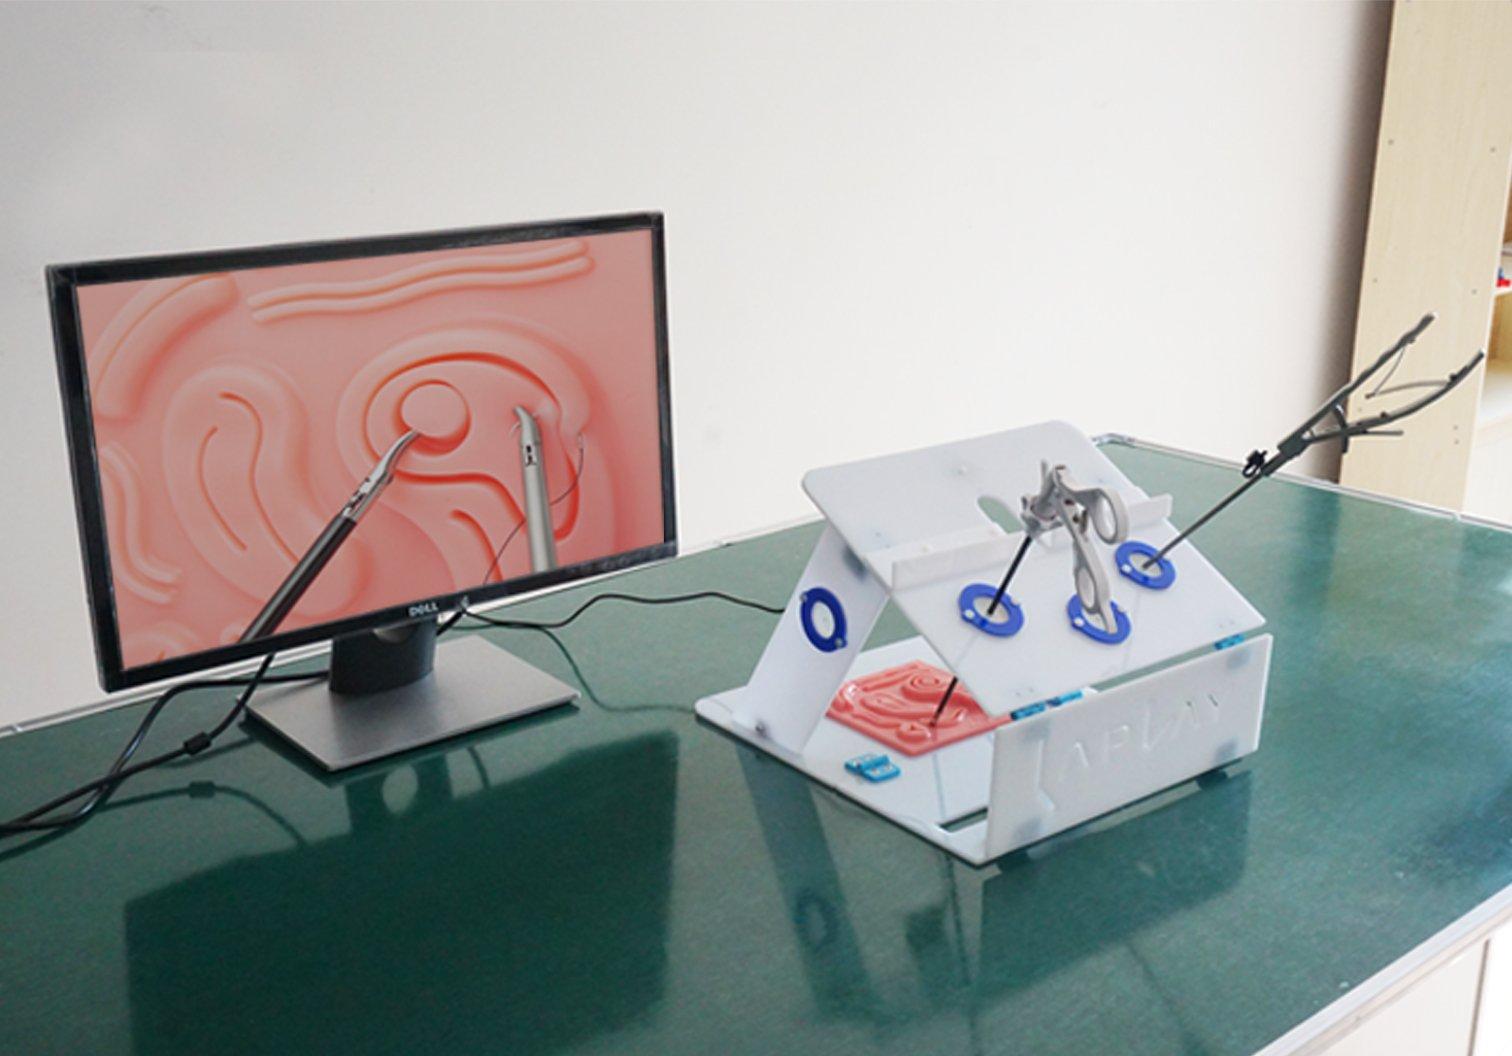 Laplay LaparoscopicTraining Box,Simulator Box,Laparoscopic Simulator with suture pad,and inset USB camera